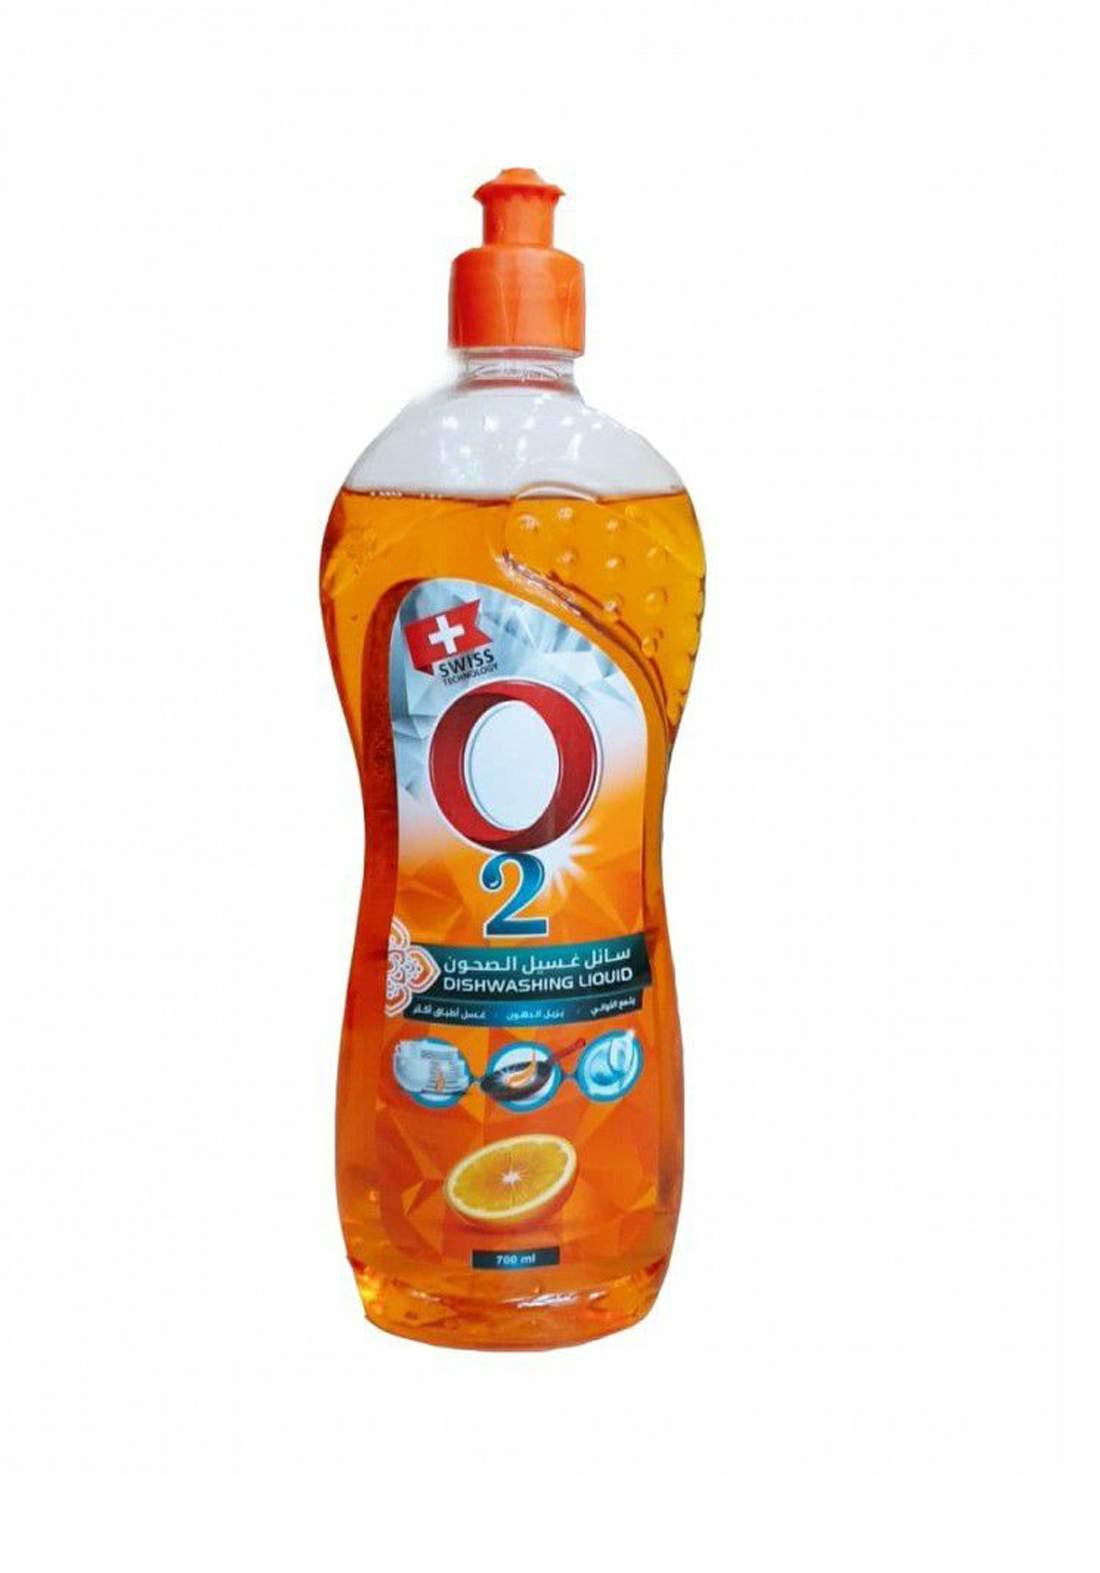 O2 Dishwashing Liquid 700 ml سائل غسيل الصحون برائحة البرتقال